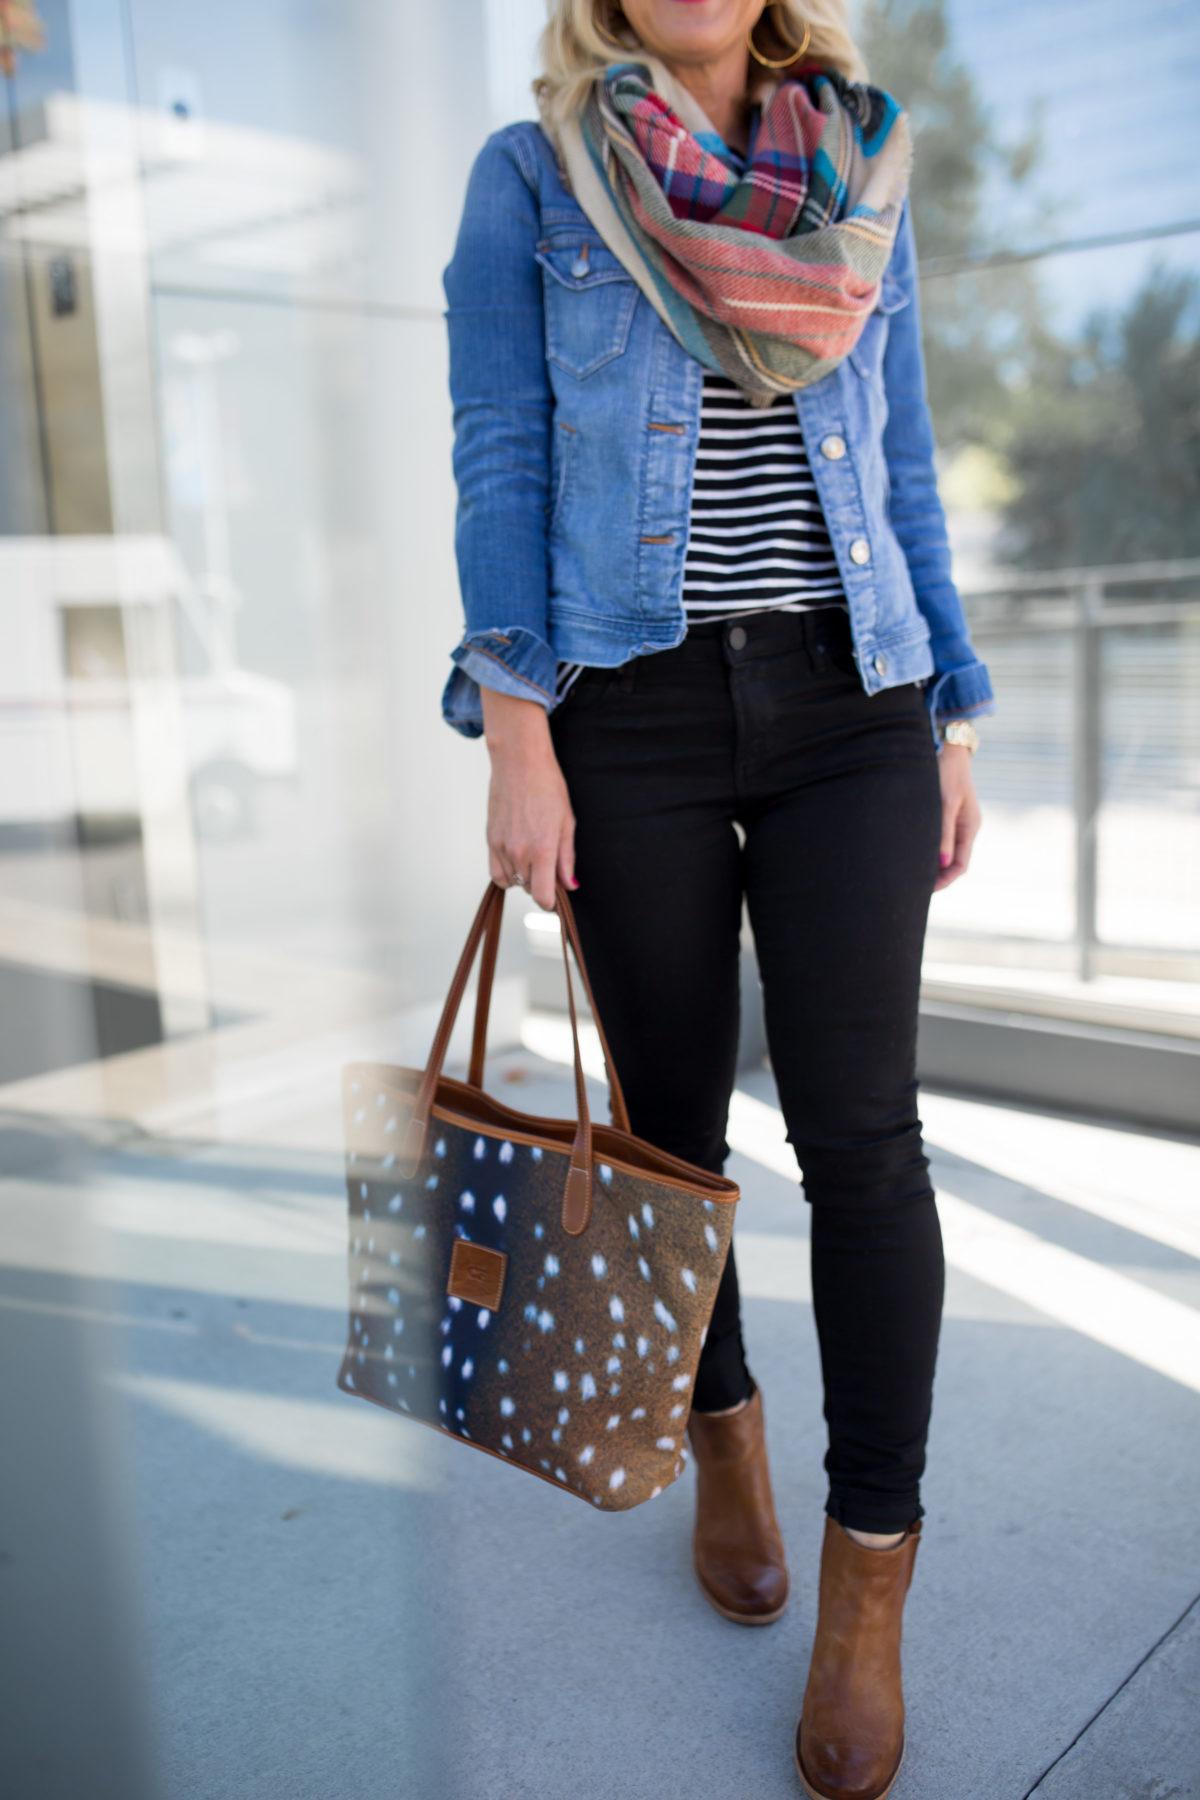 Black Jeans | Stripes & Plaid